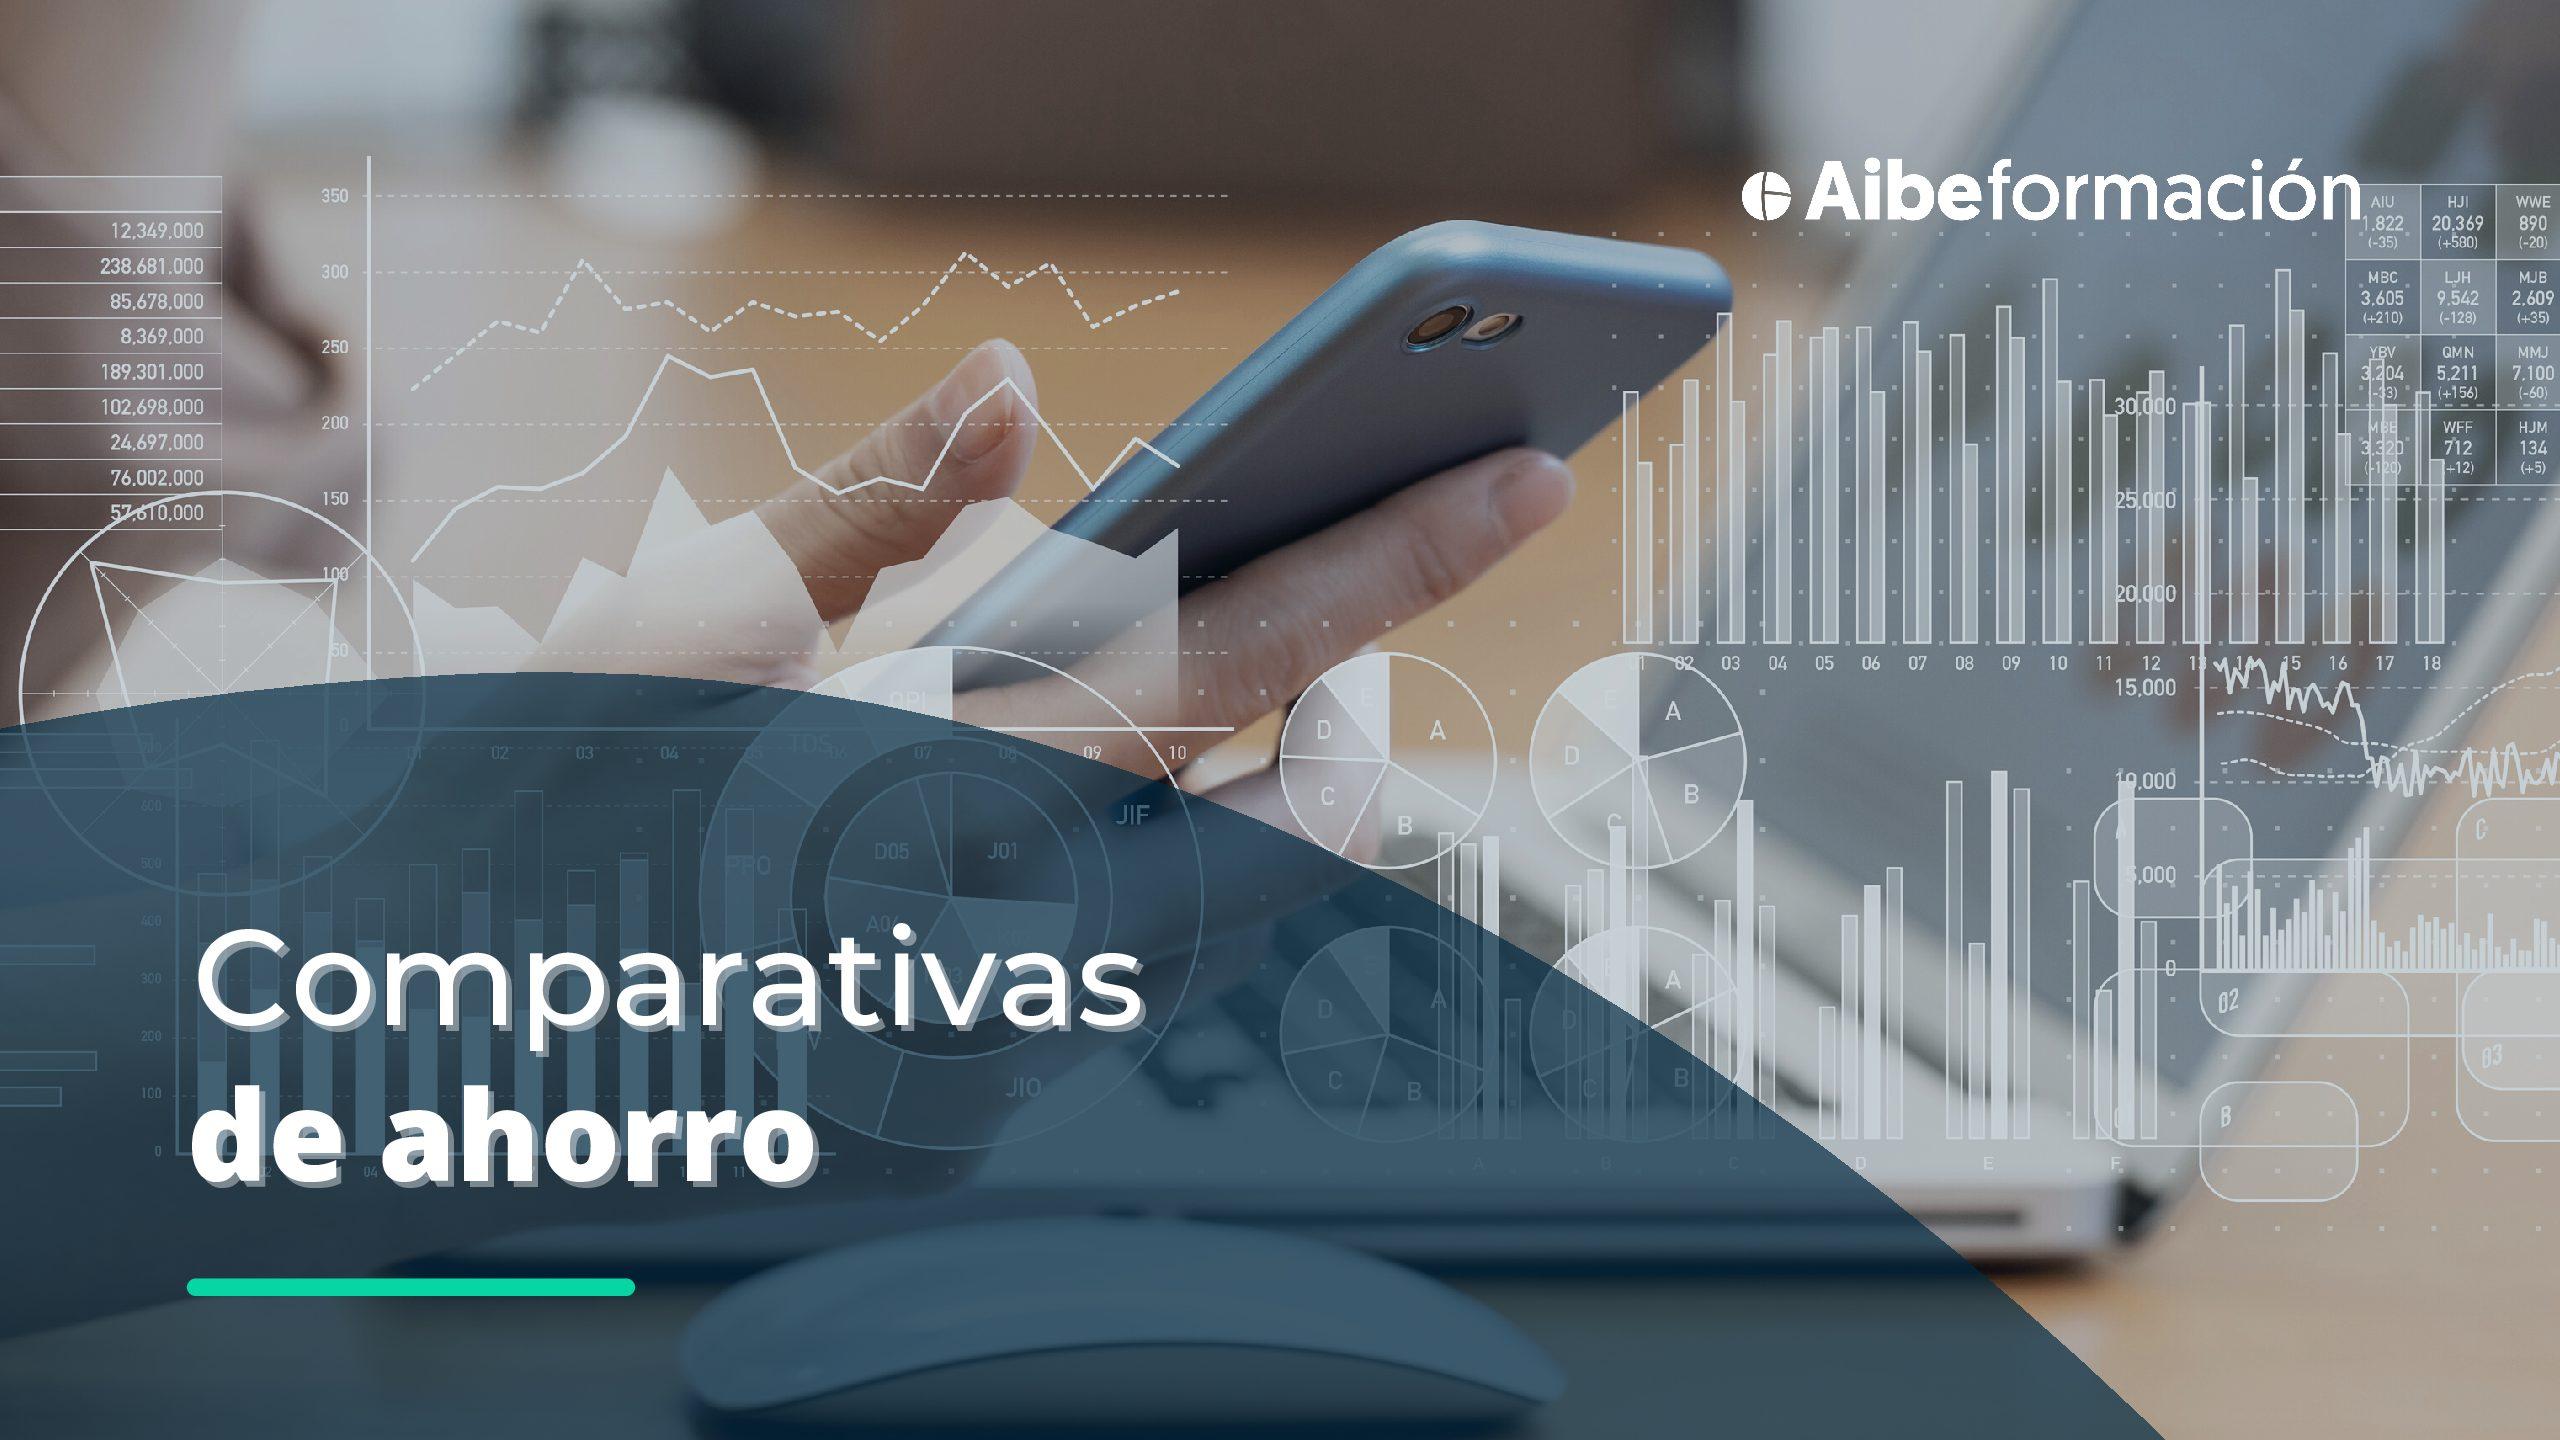 https://www.aibeformacion.com/wp-content/uploads/2021/07/Comparativas-pdf.jpg